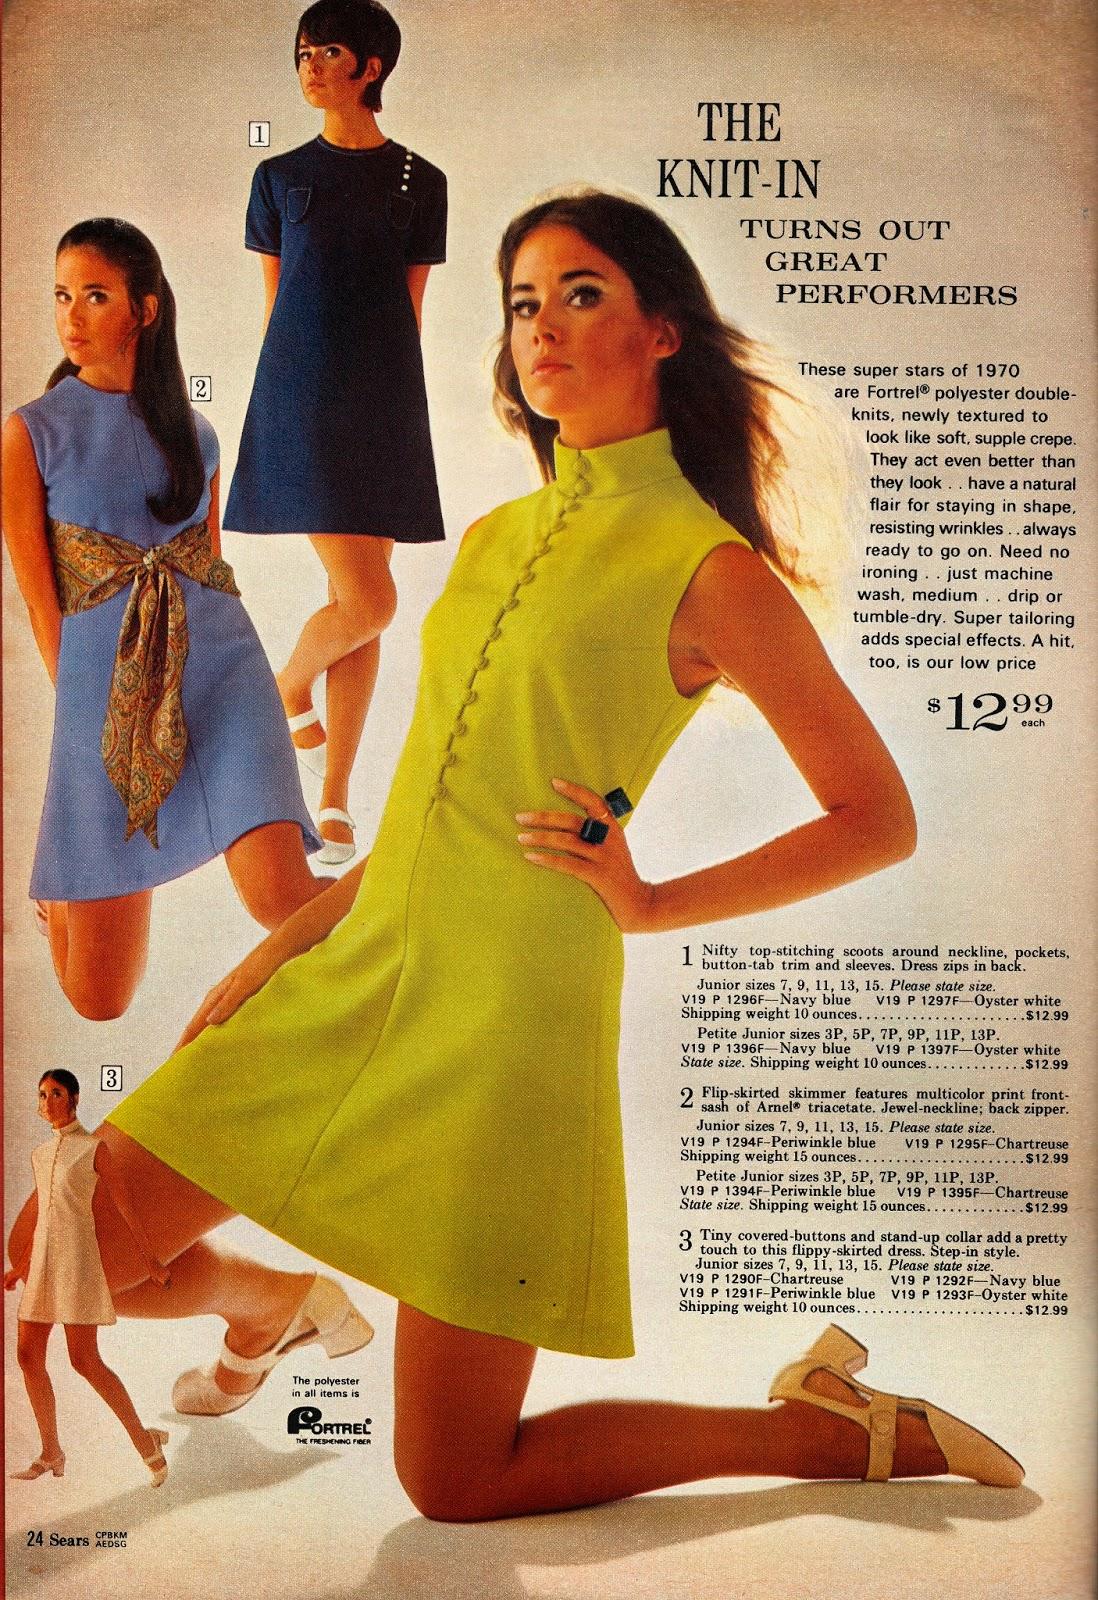 Loyal 2019 Spring Summer New Fashion Blouse Lattice Dot Printing Long Sleeve Bow Collar Long Sleeve Shirt For Woman R644 Blouses & Shirts